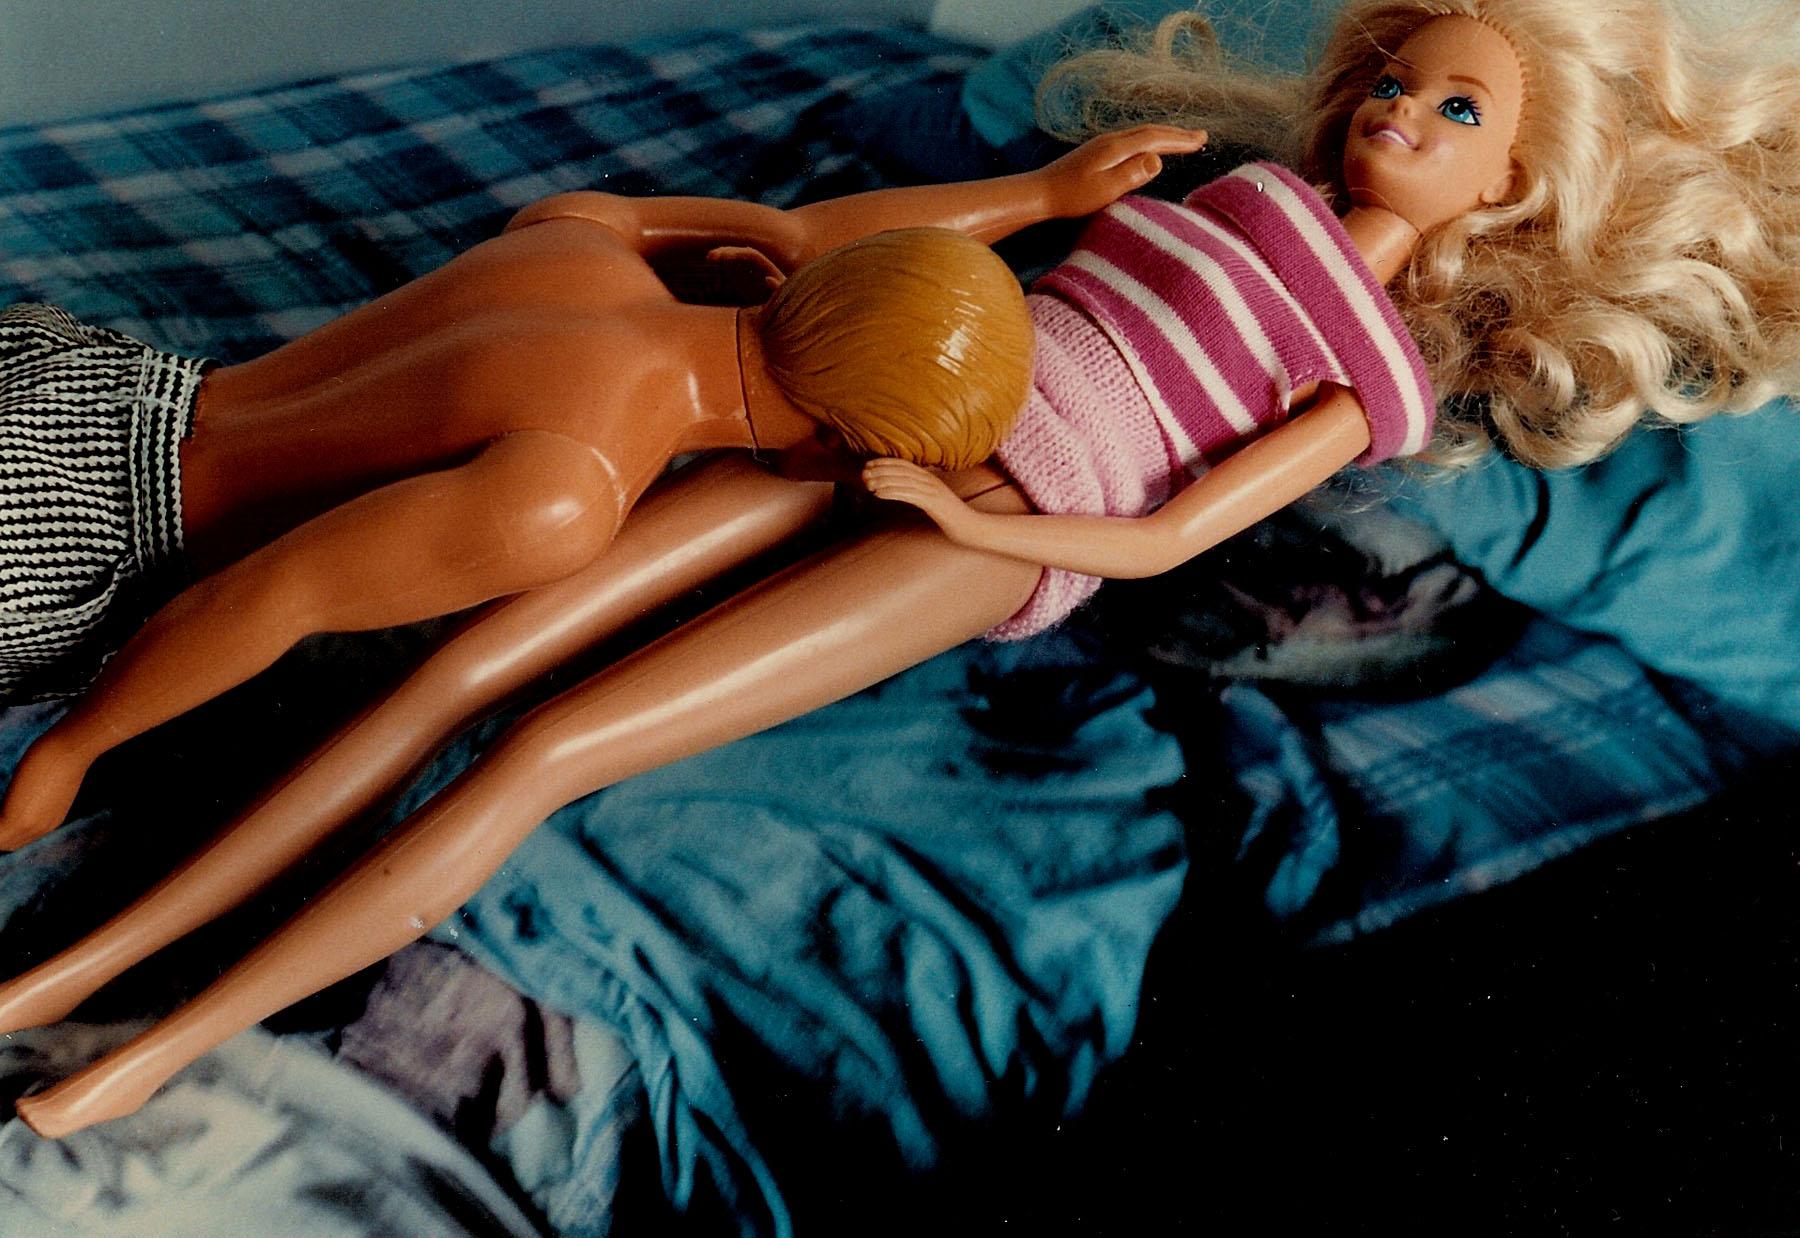 Cunniliingus Barbie